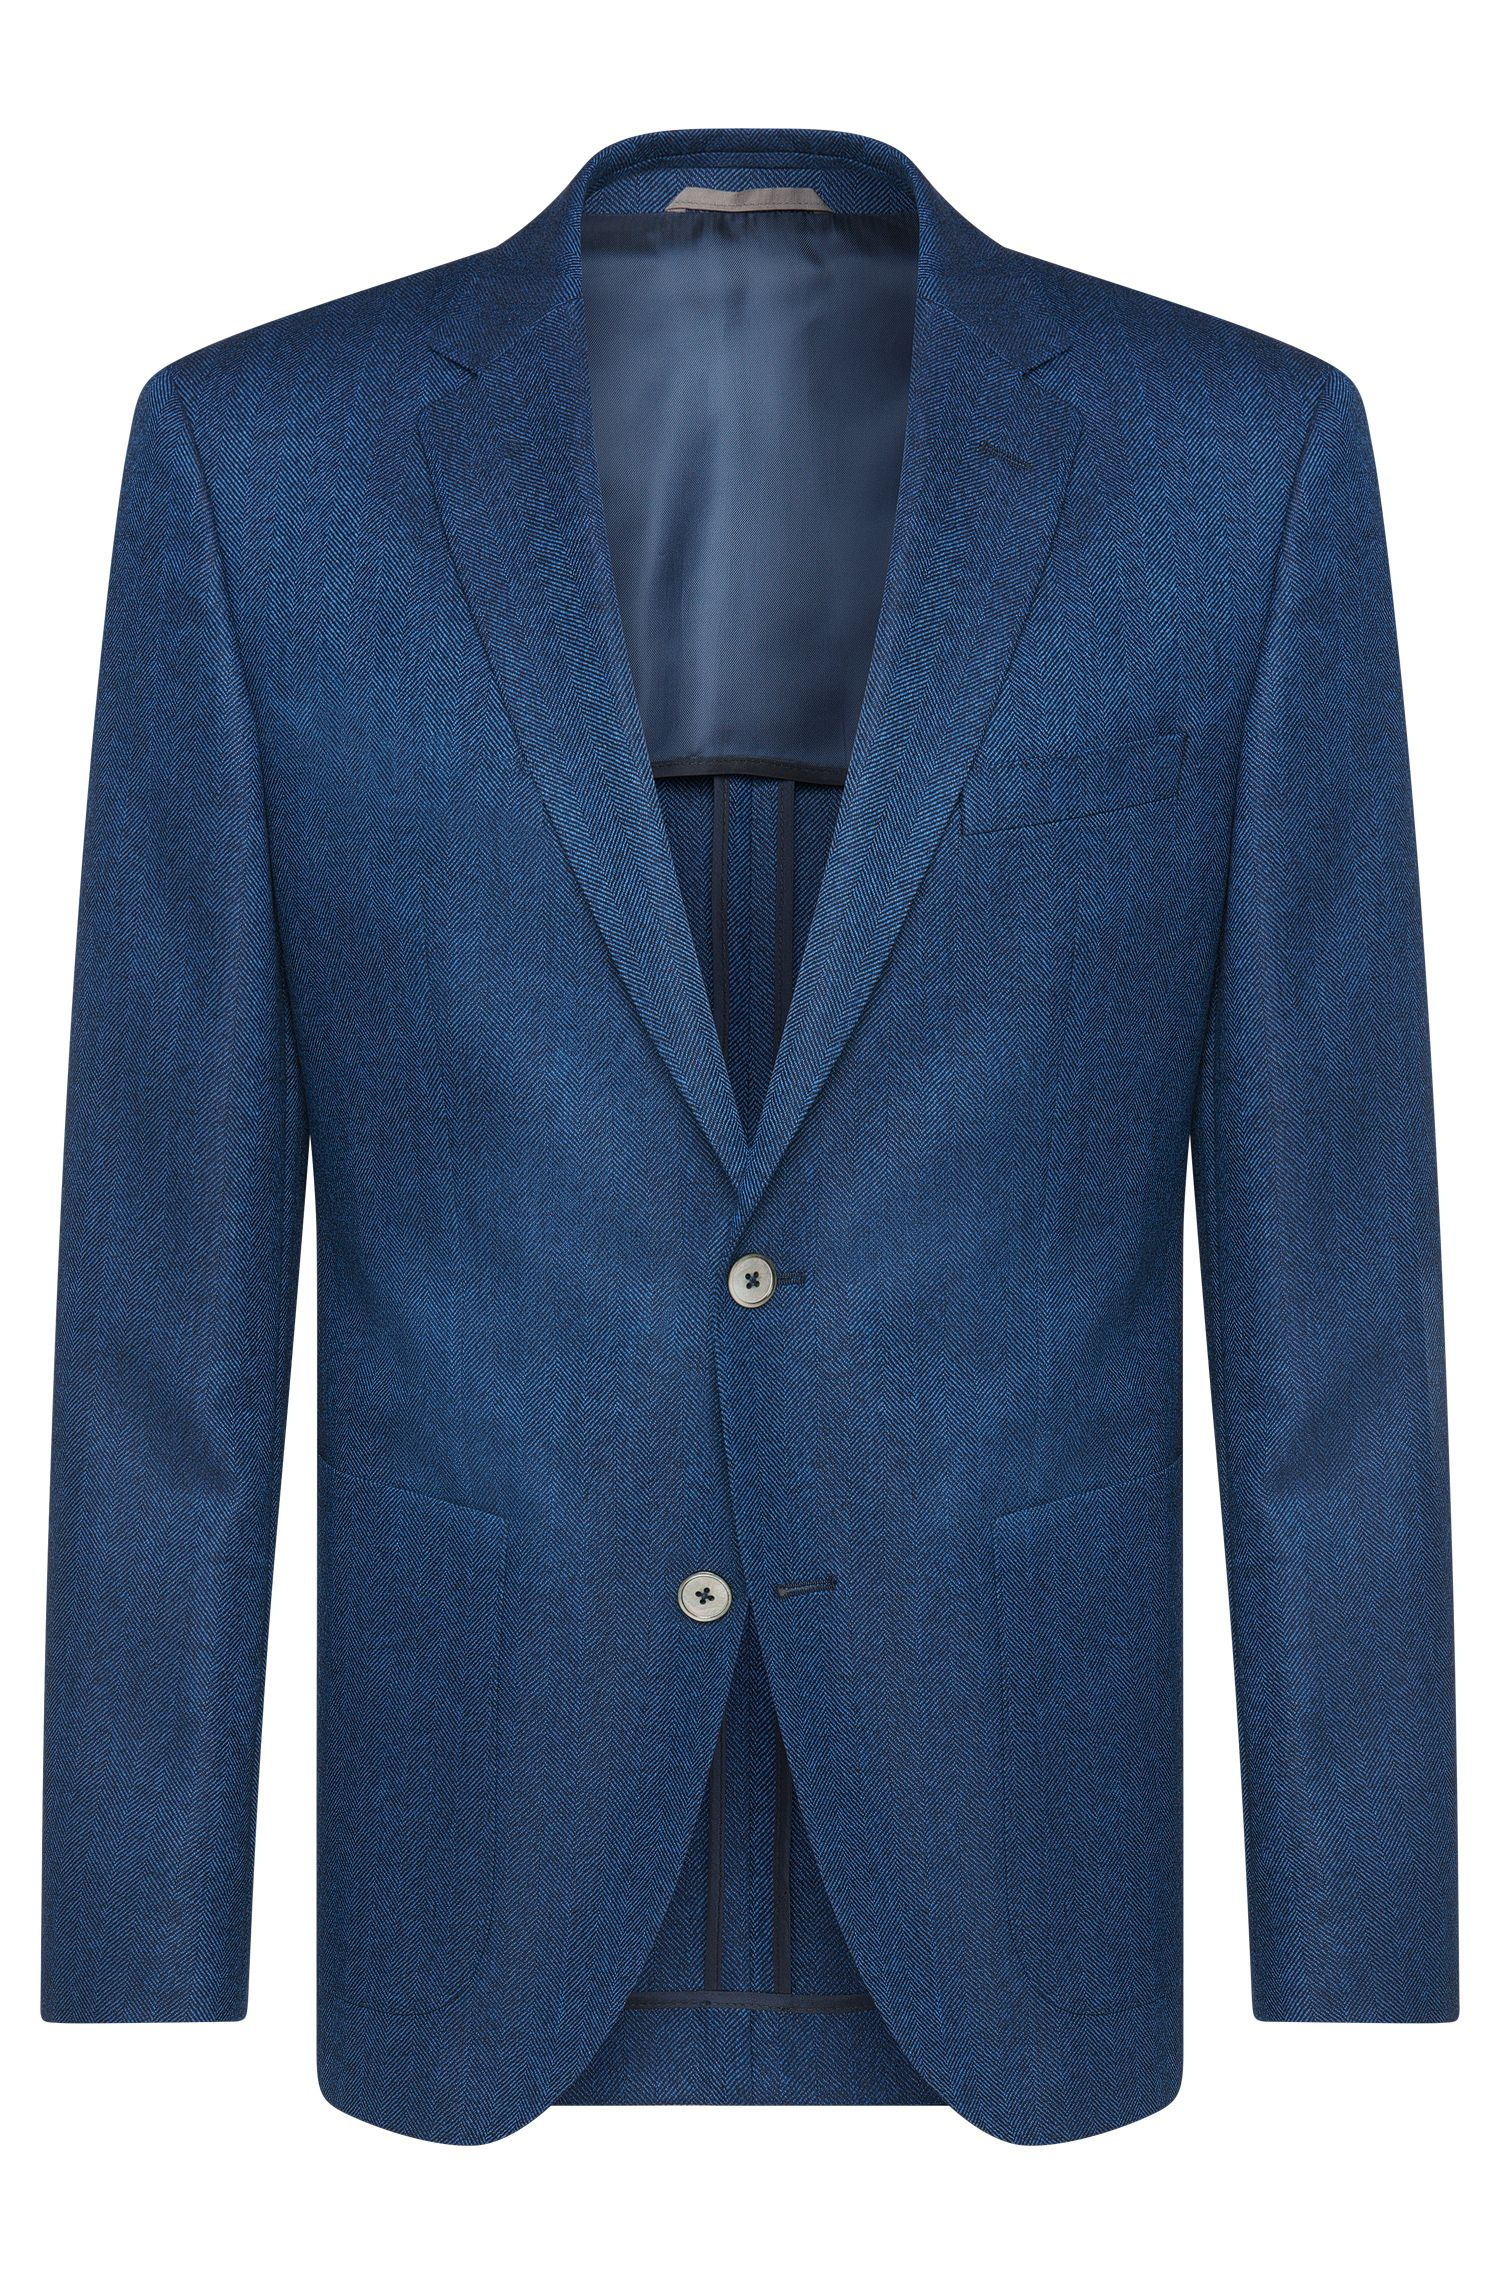 'Janson' | Regular Fit, Super 100 Virgin Wool Herringbone Sport Coat